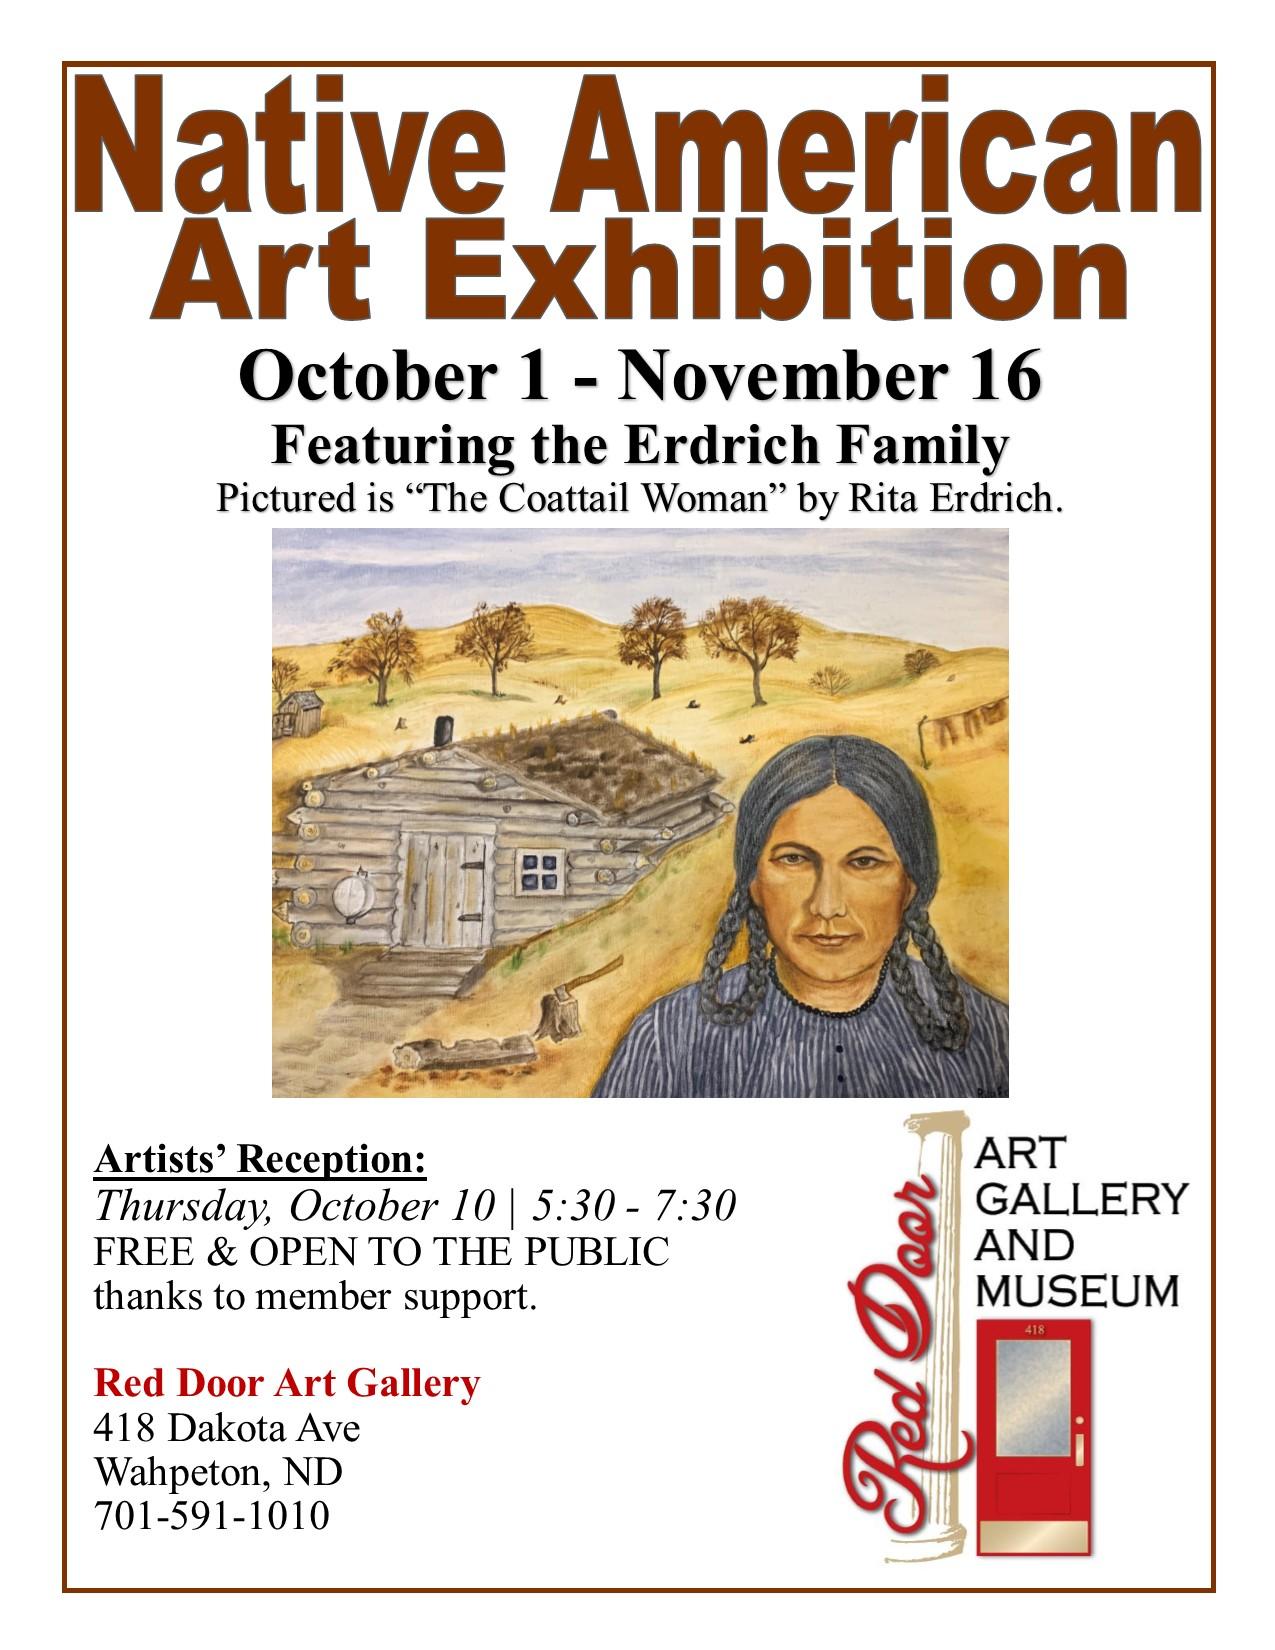 Native American Exhibition flyer.jpg